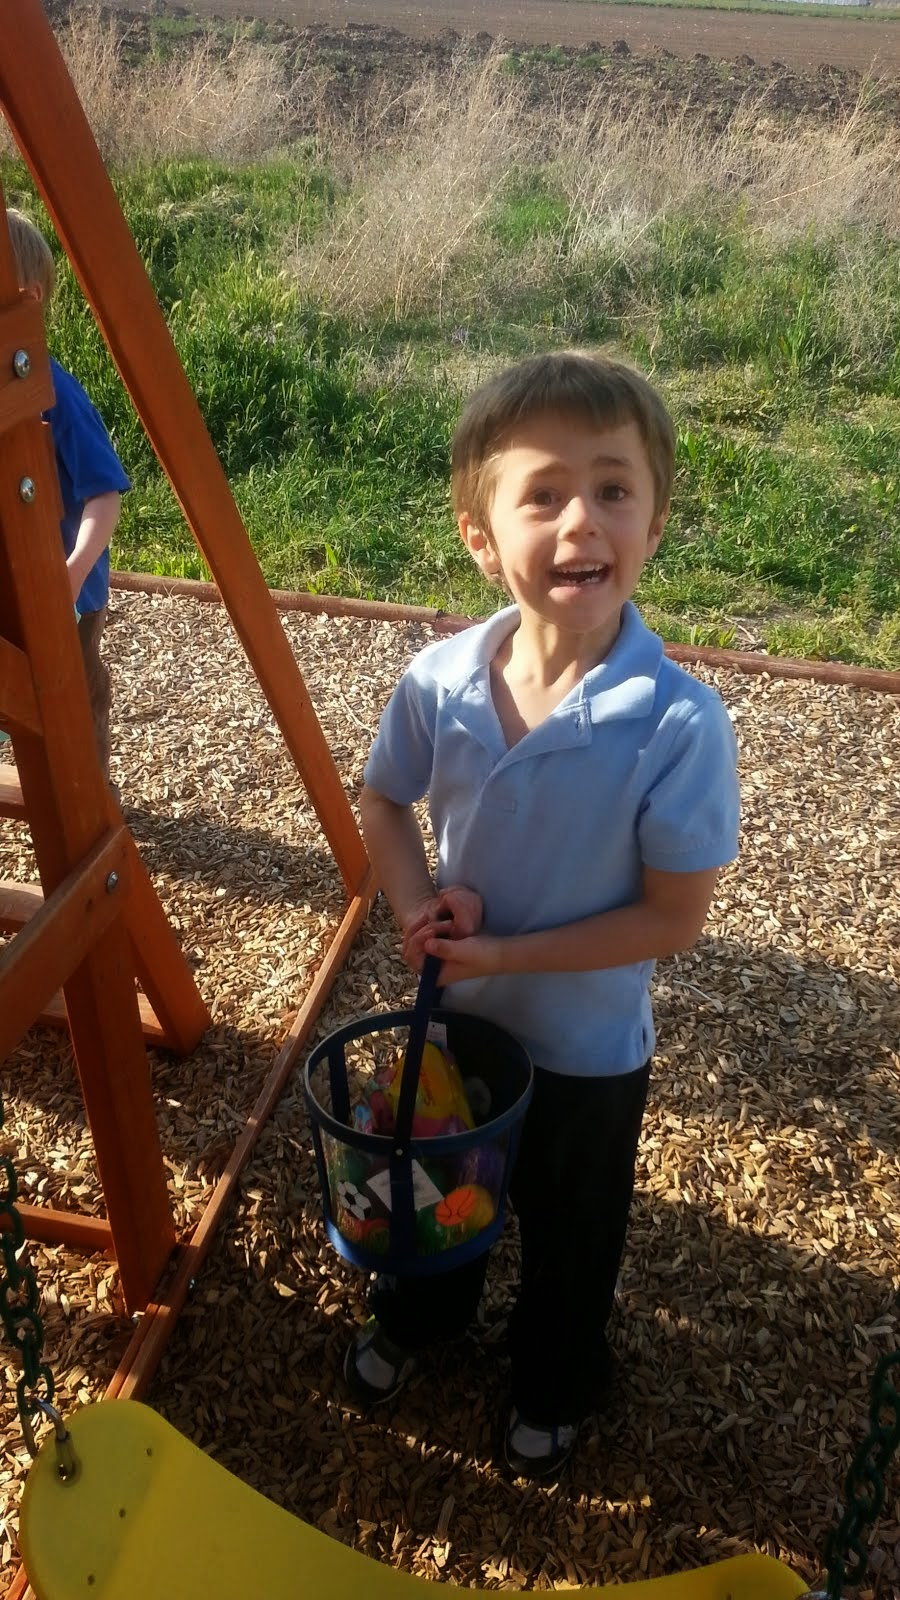 Samuel, age 6